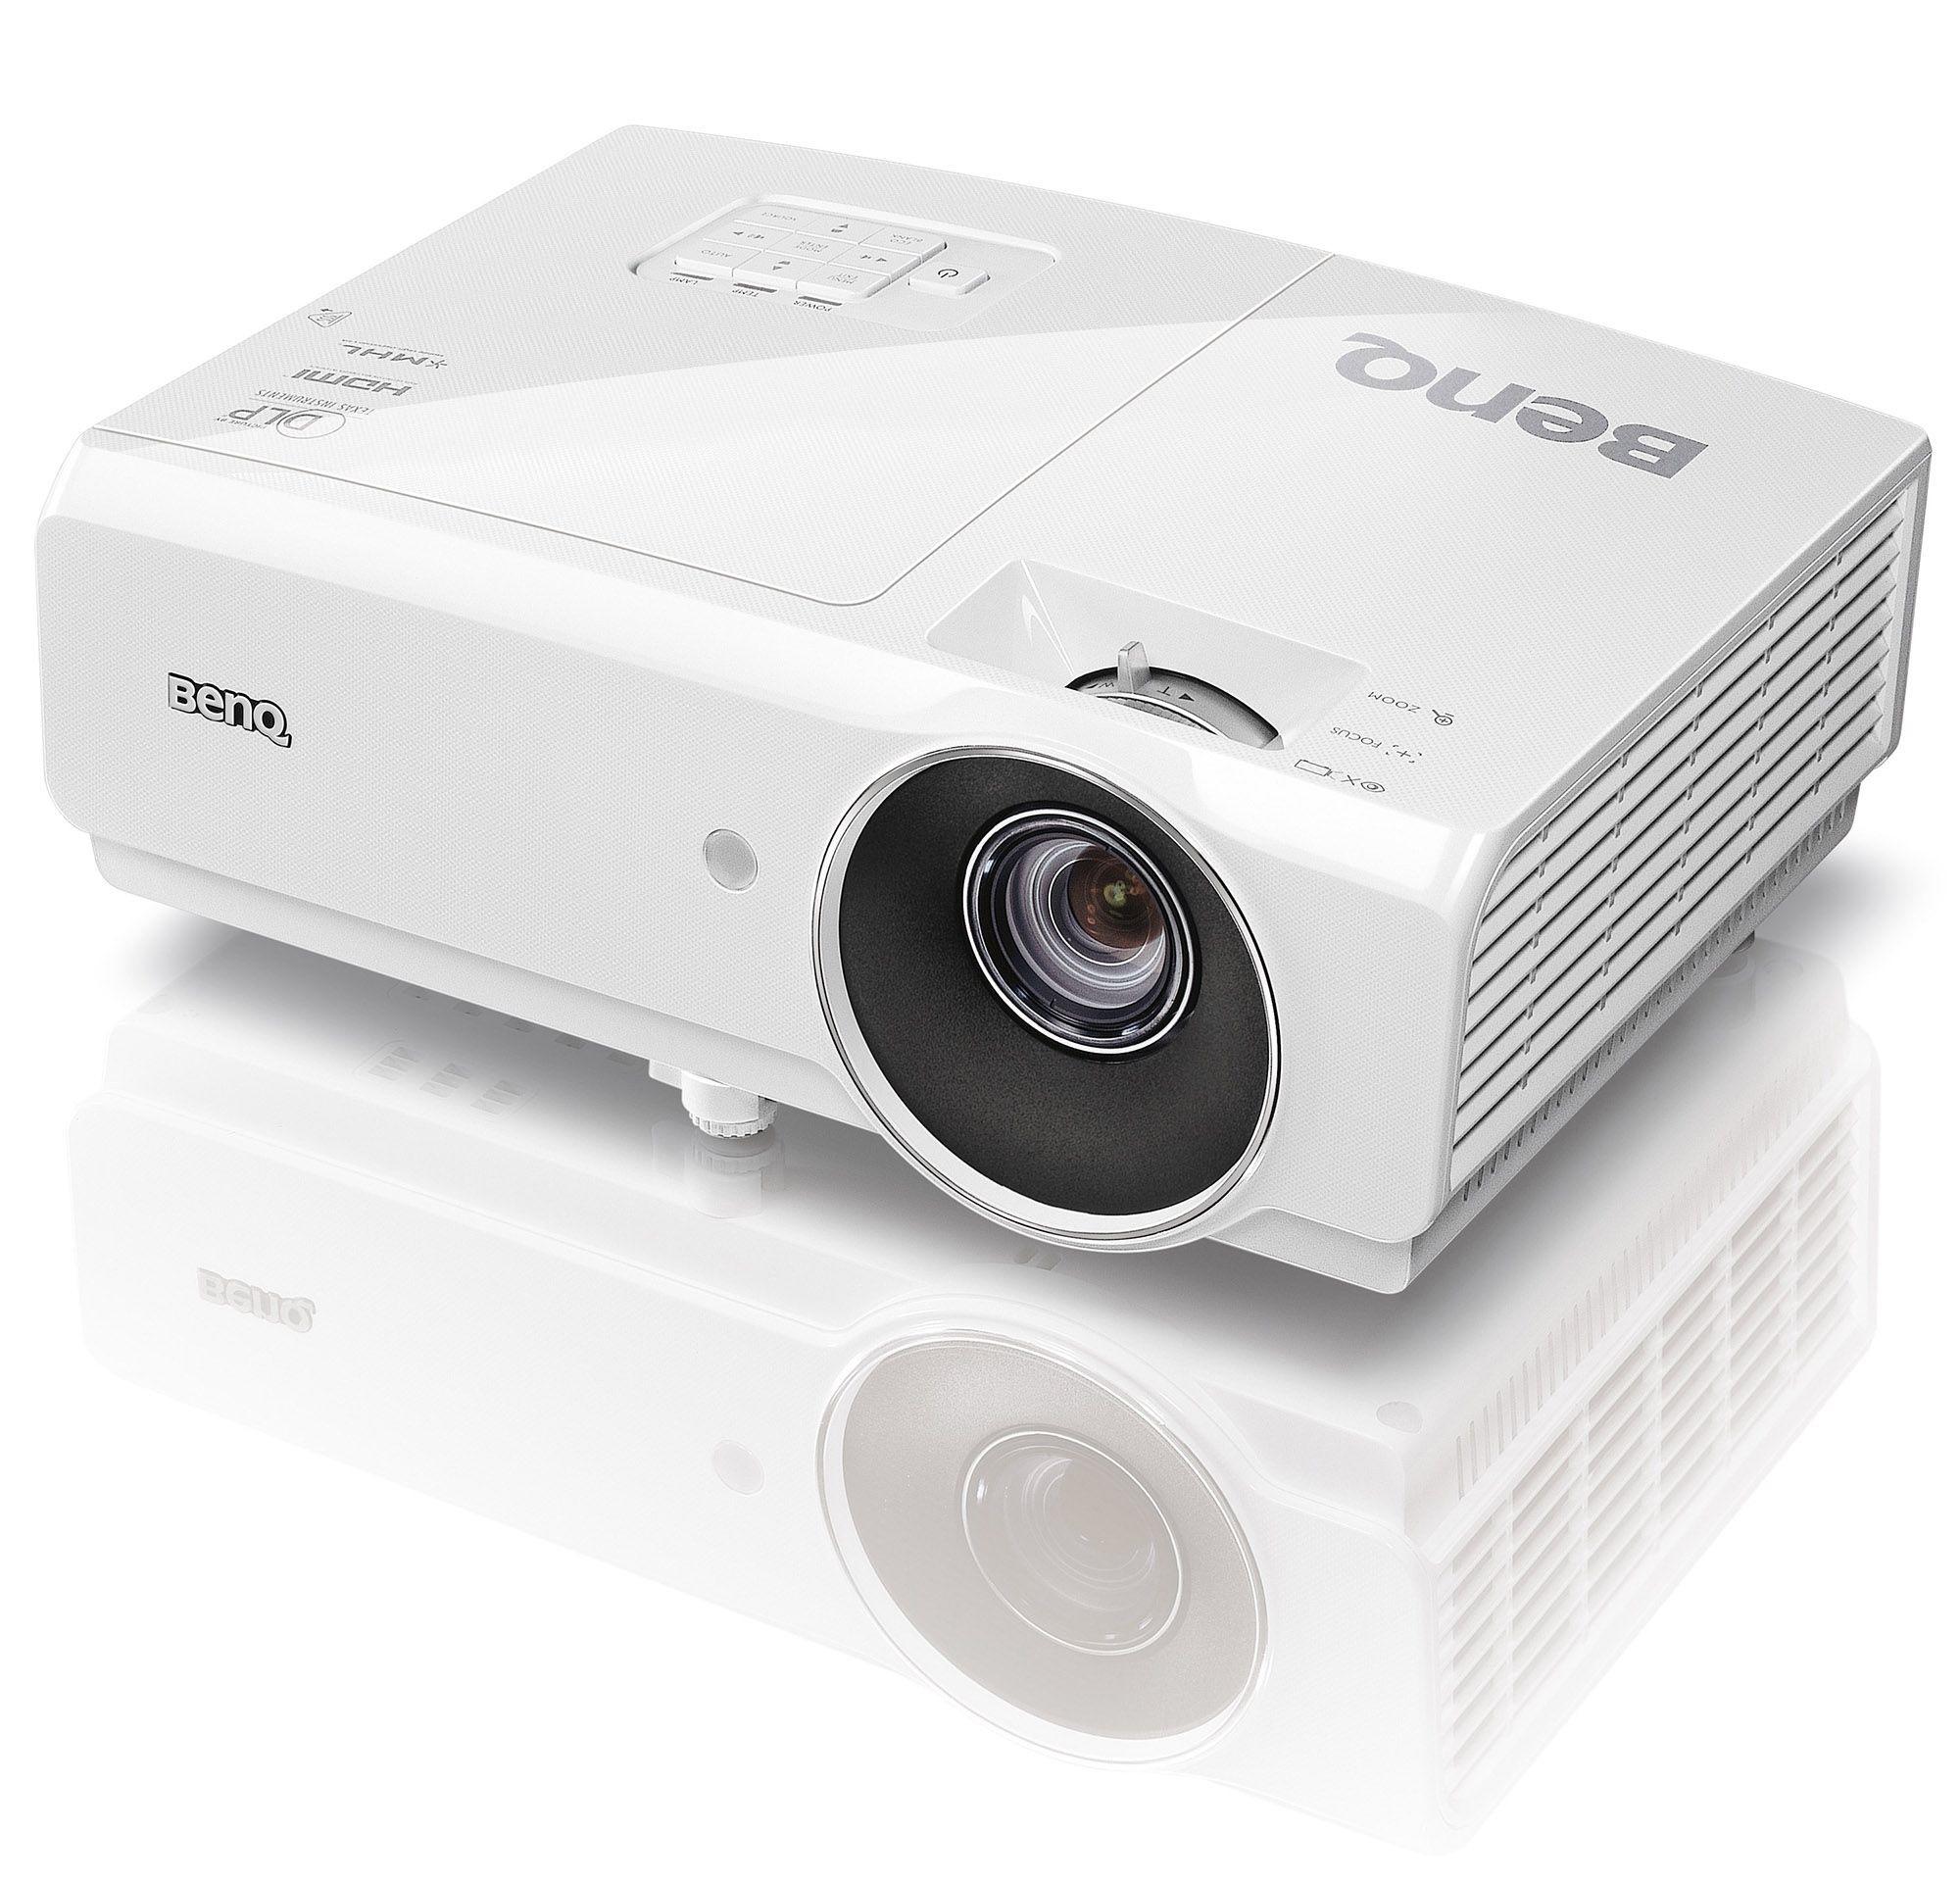 Descriere Videoproiector BENQ 3D MH741, Full HD, 3D, 4000 lumeni, HDMI